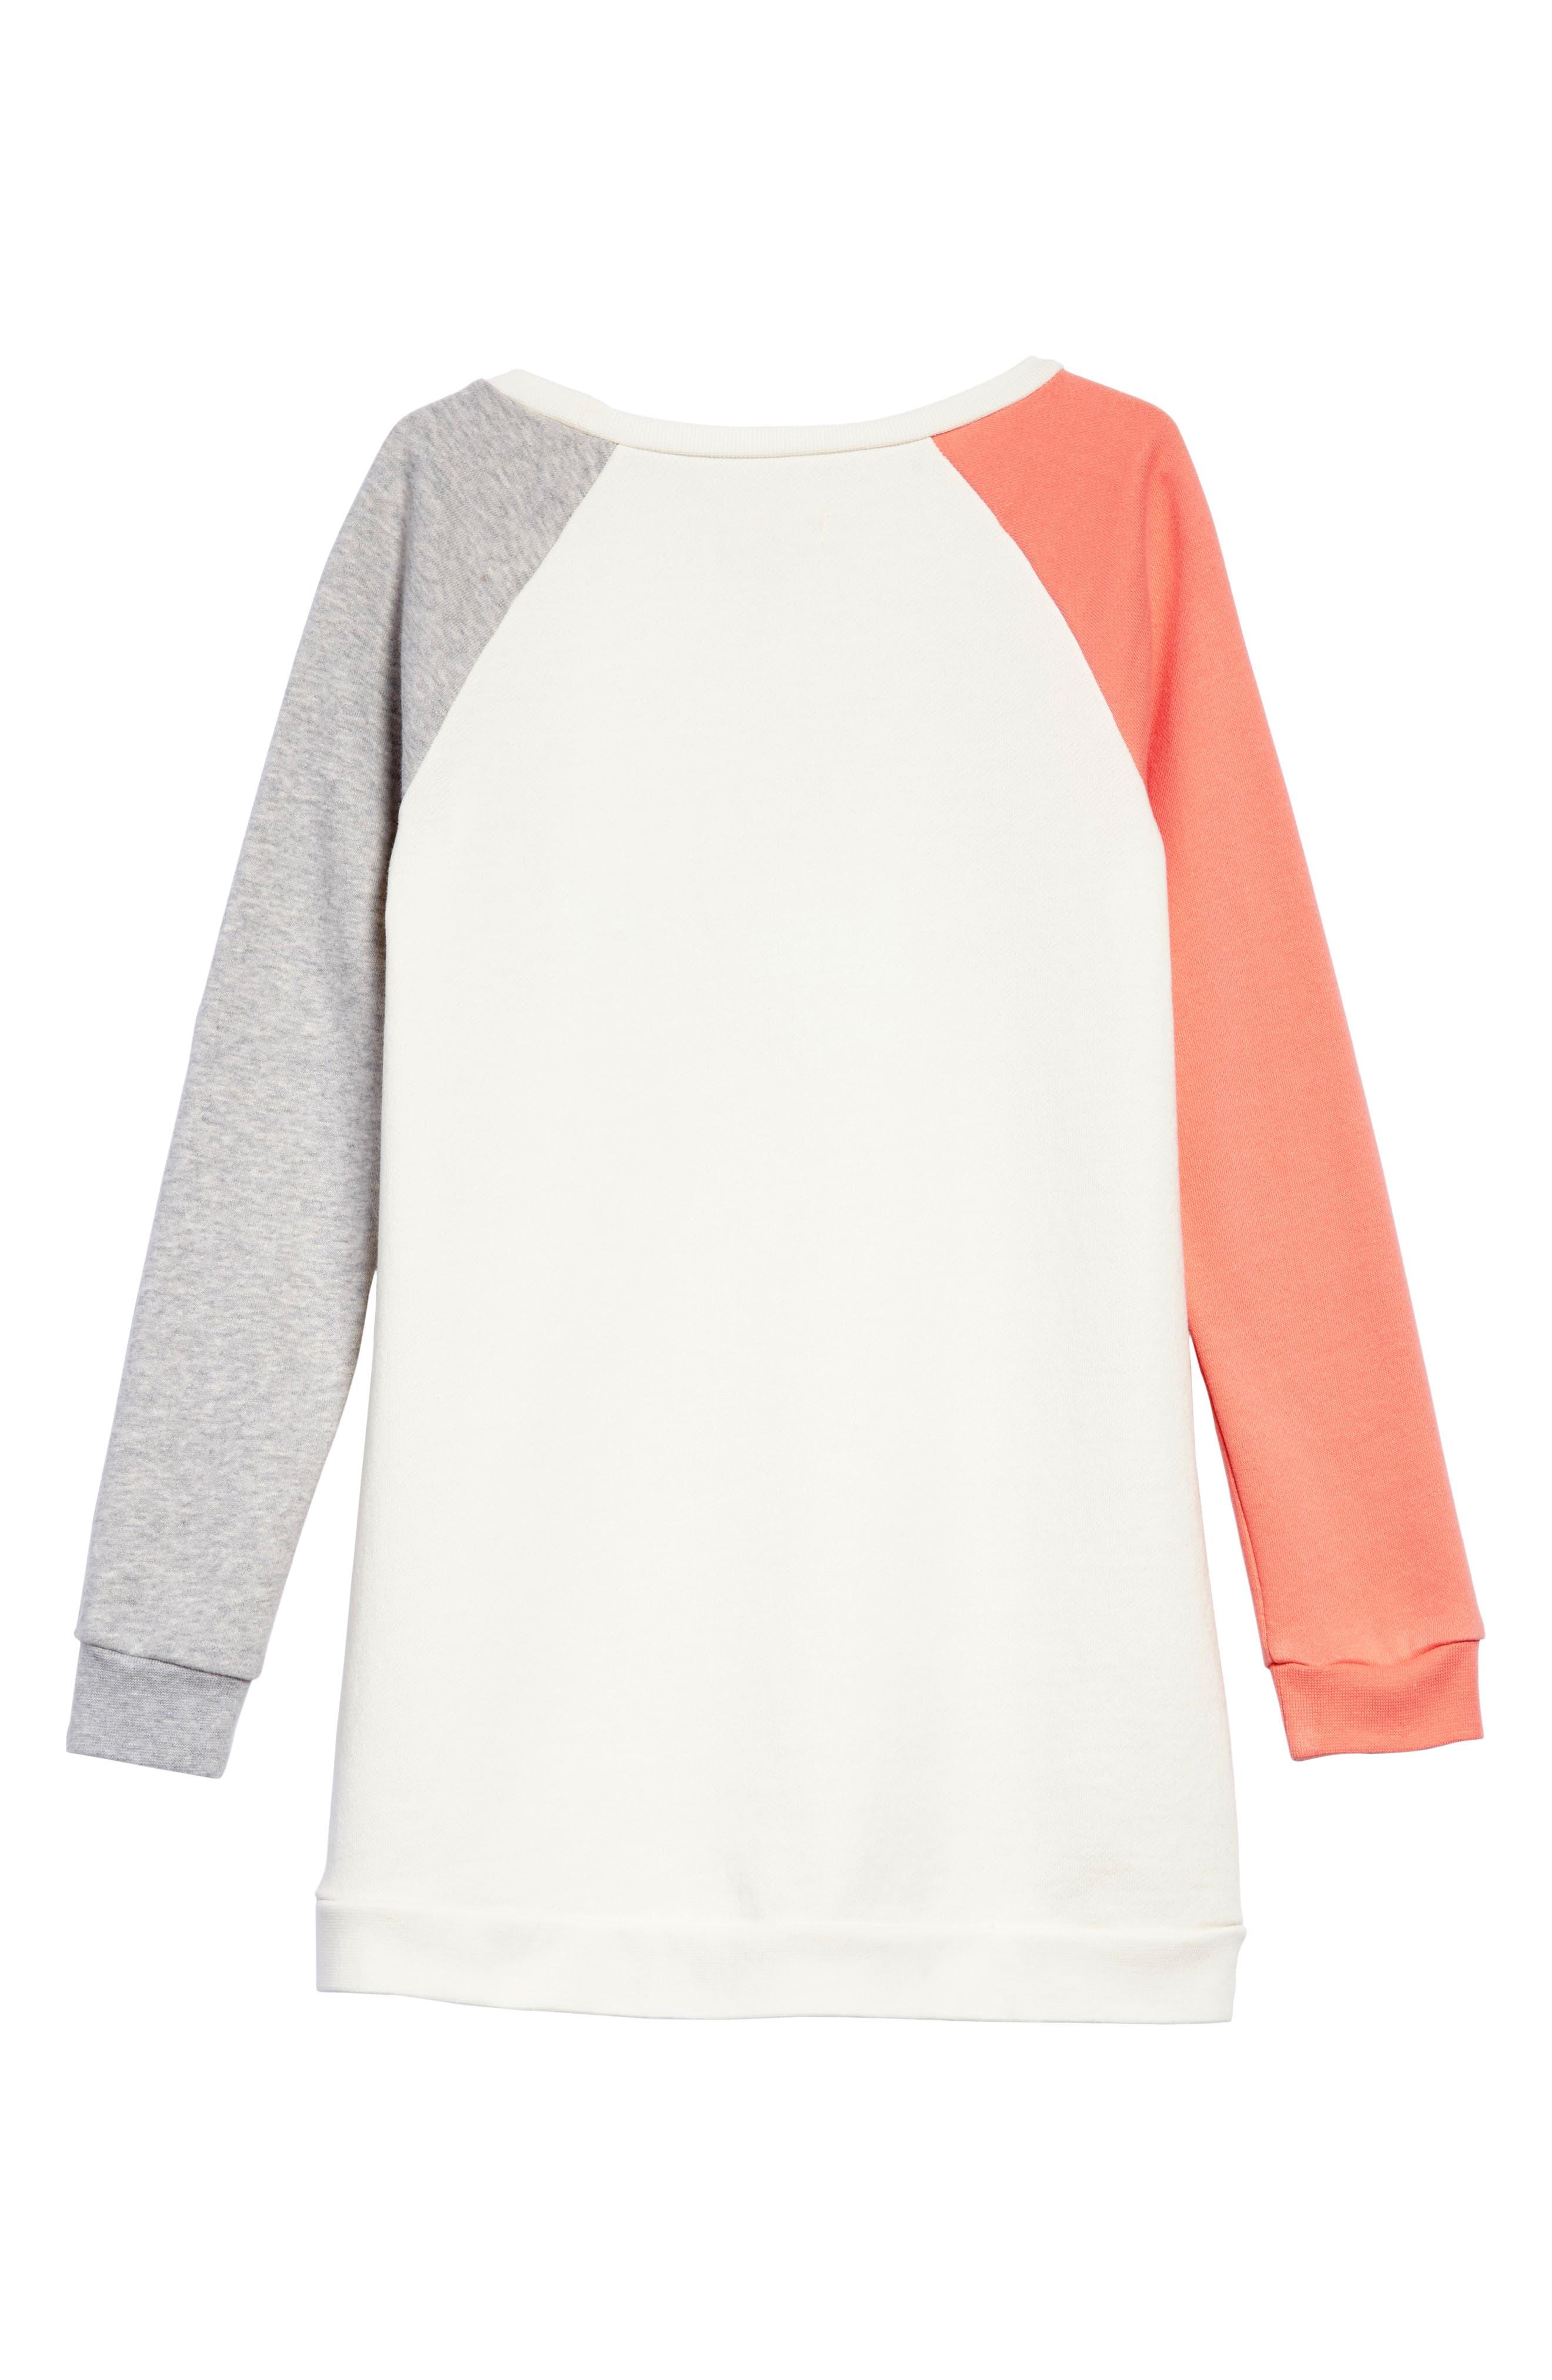 Sweatshirt Dress,                             Alternate thumbnail 2, color,                             Ivory Egret Daydream